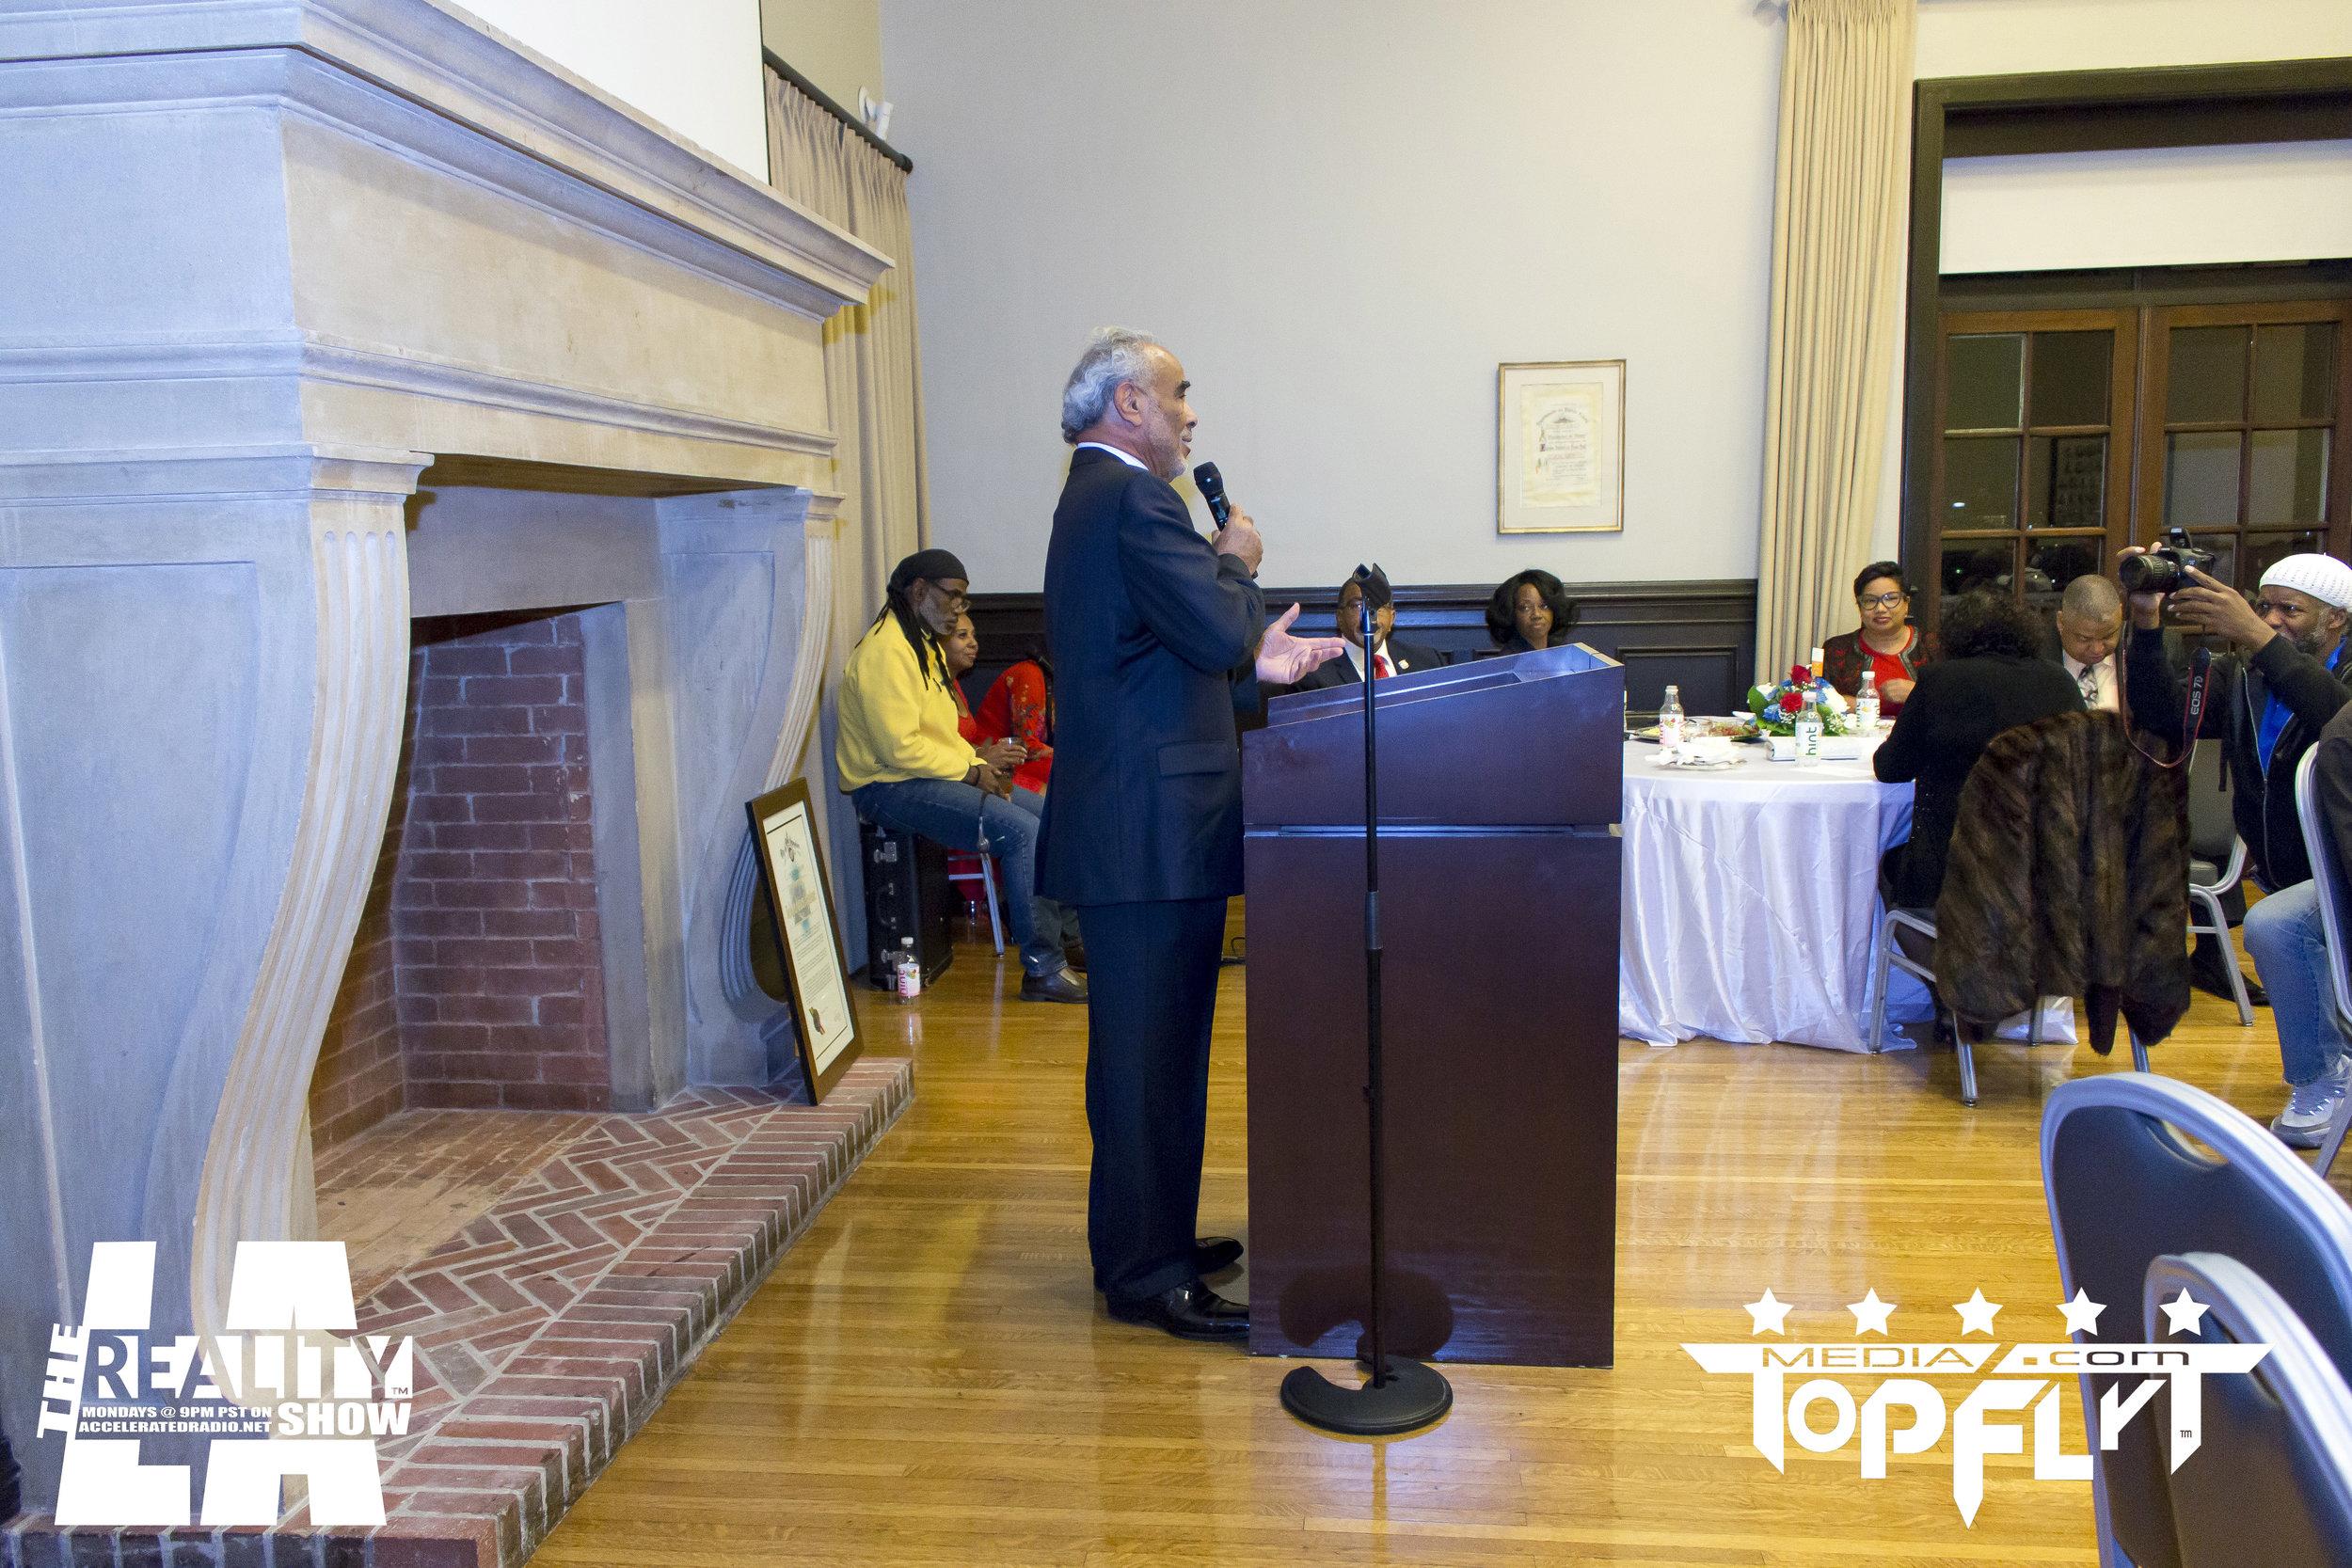 The Reality Show LA - Tuskegee Airmen 75th Anniversary VIP Reception_130.jpg